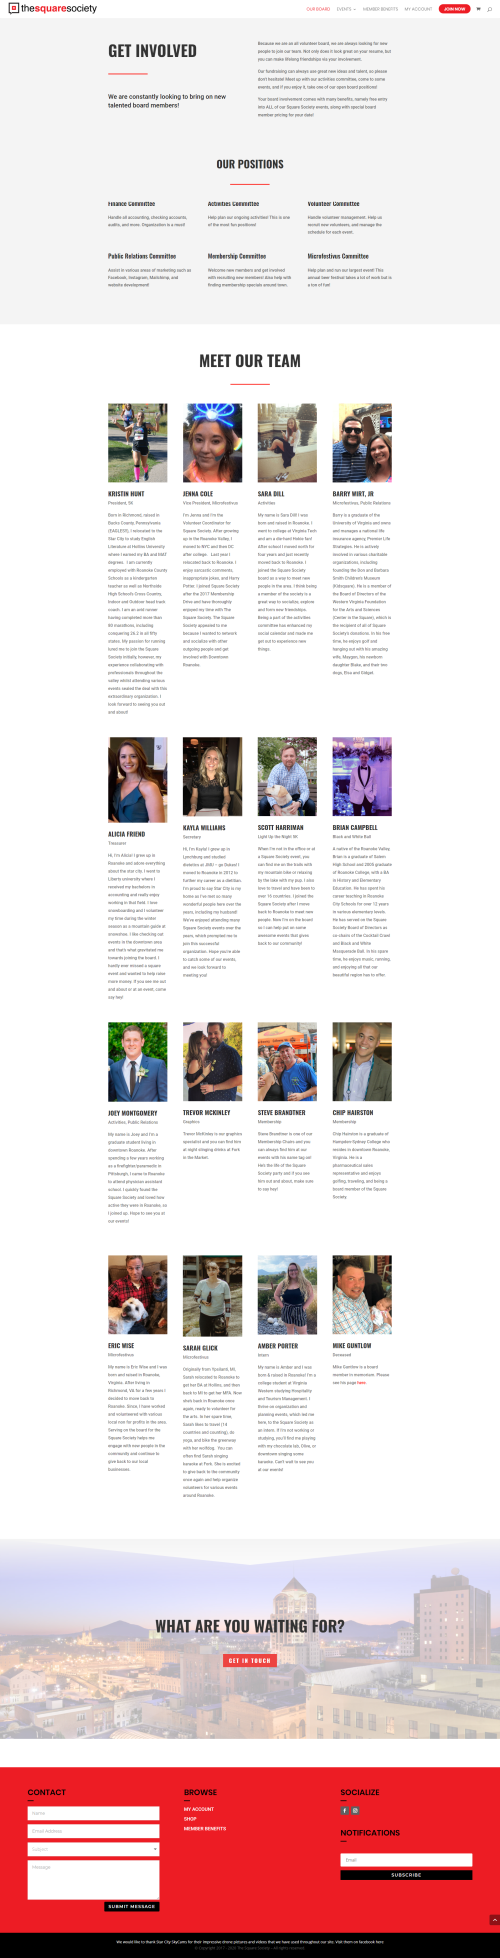 Square Society Board Page